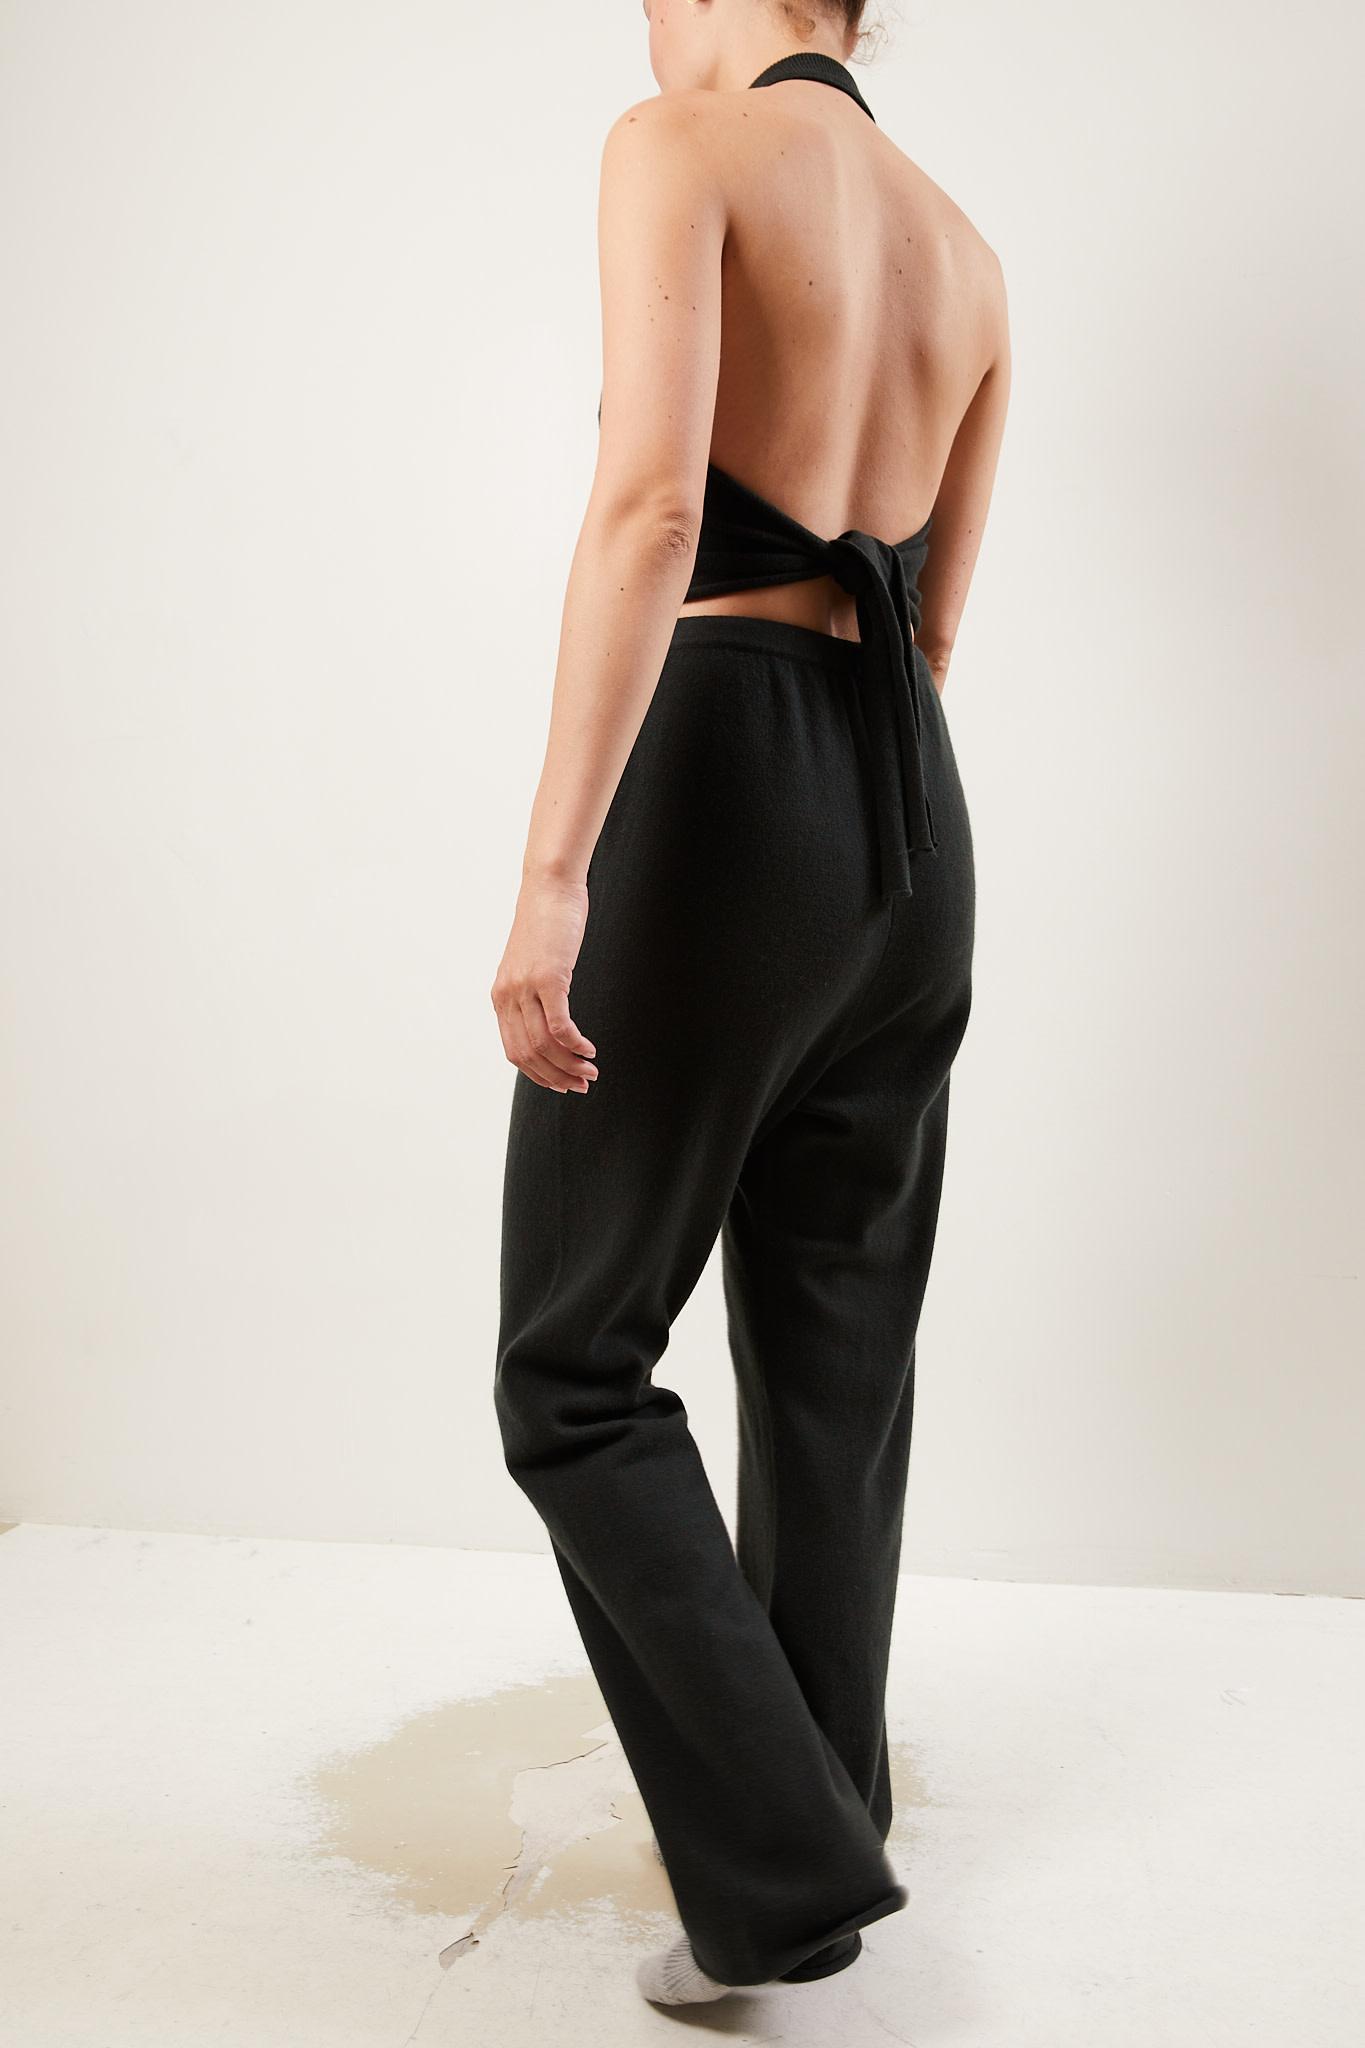 extreme cashmere - Run cashmere pant